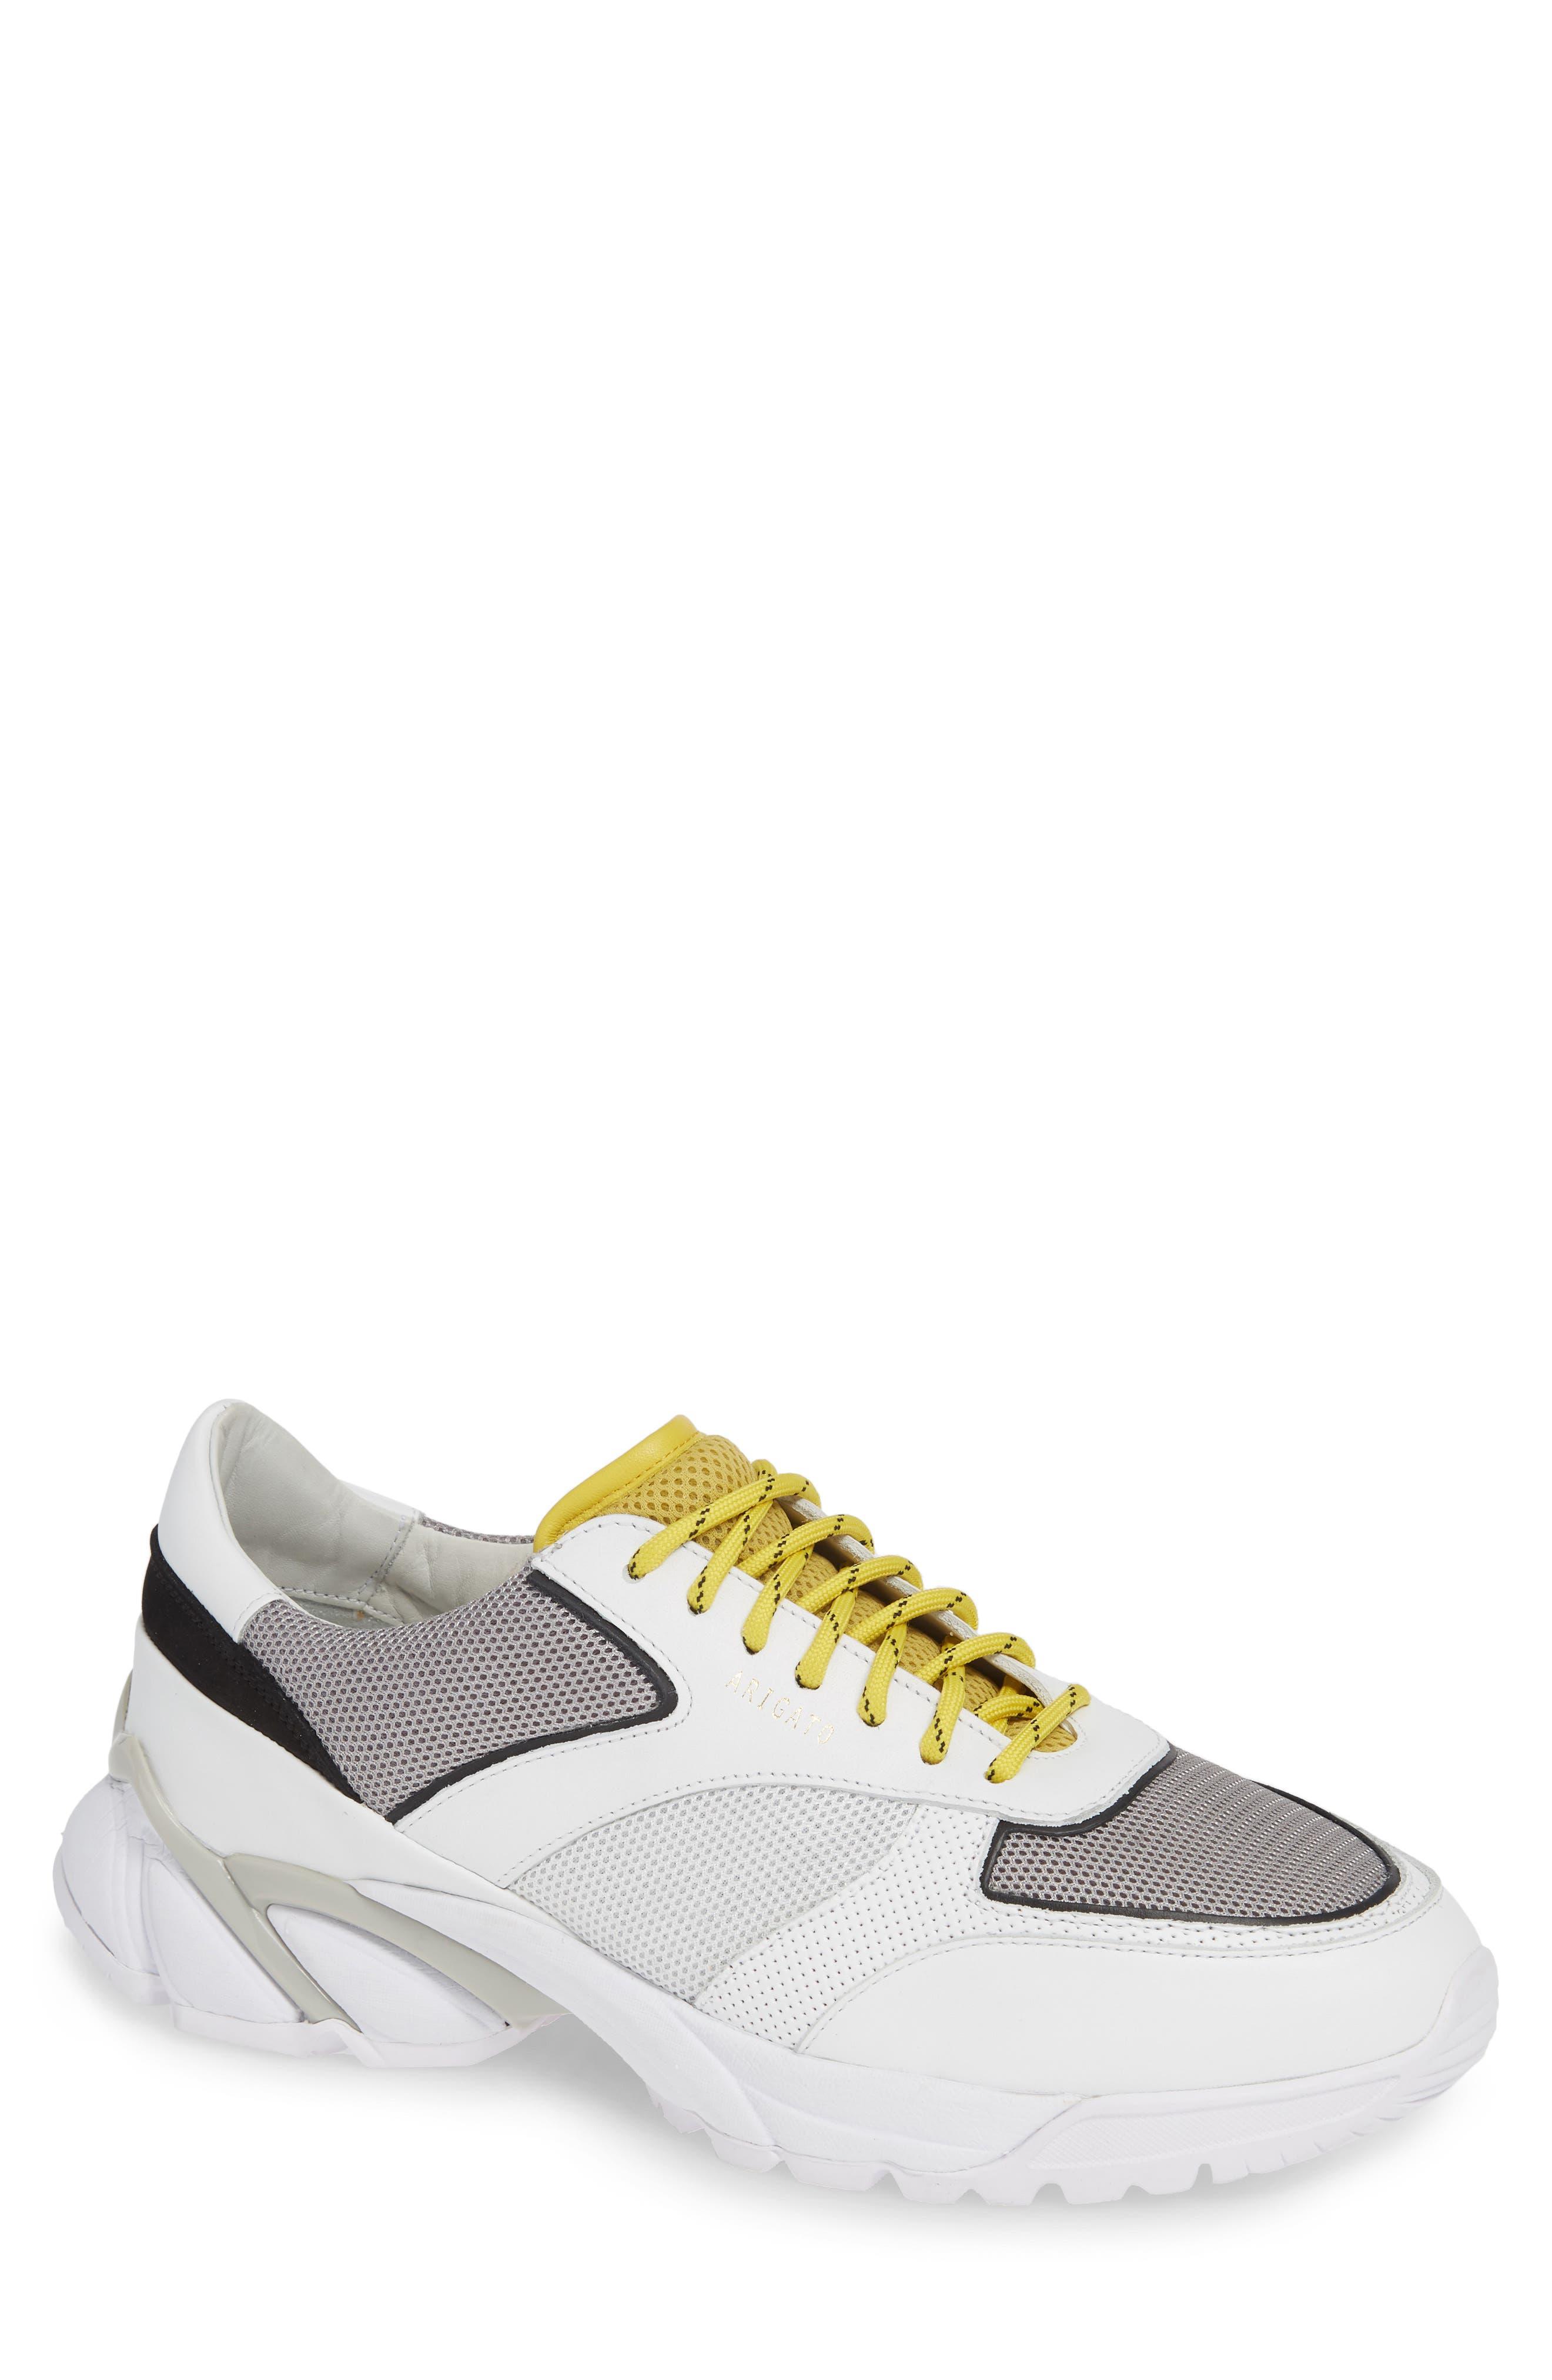 Tech Sneaker,                         Main,                         color, 100